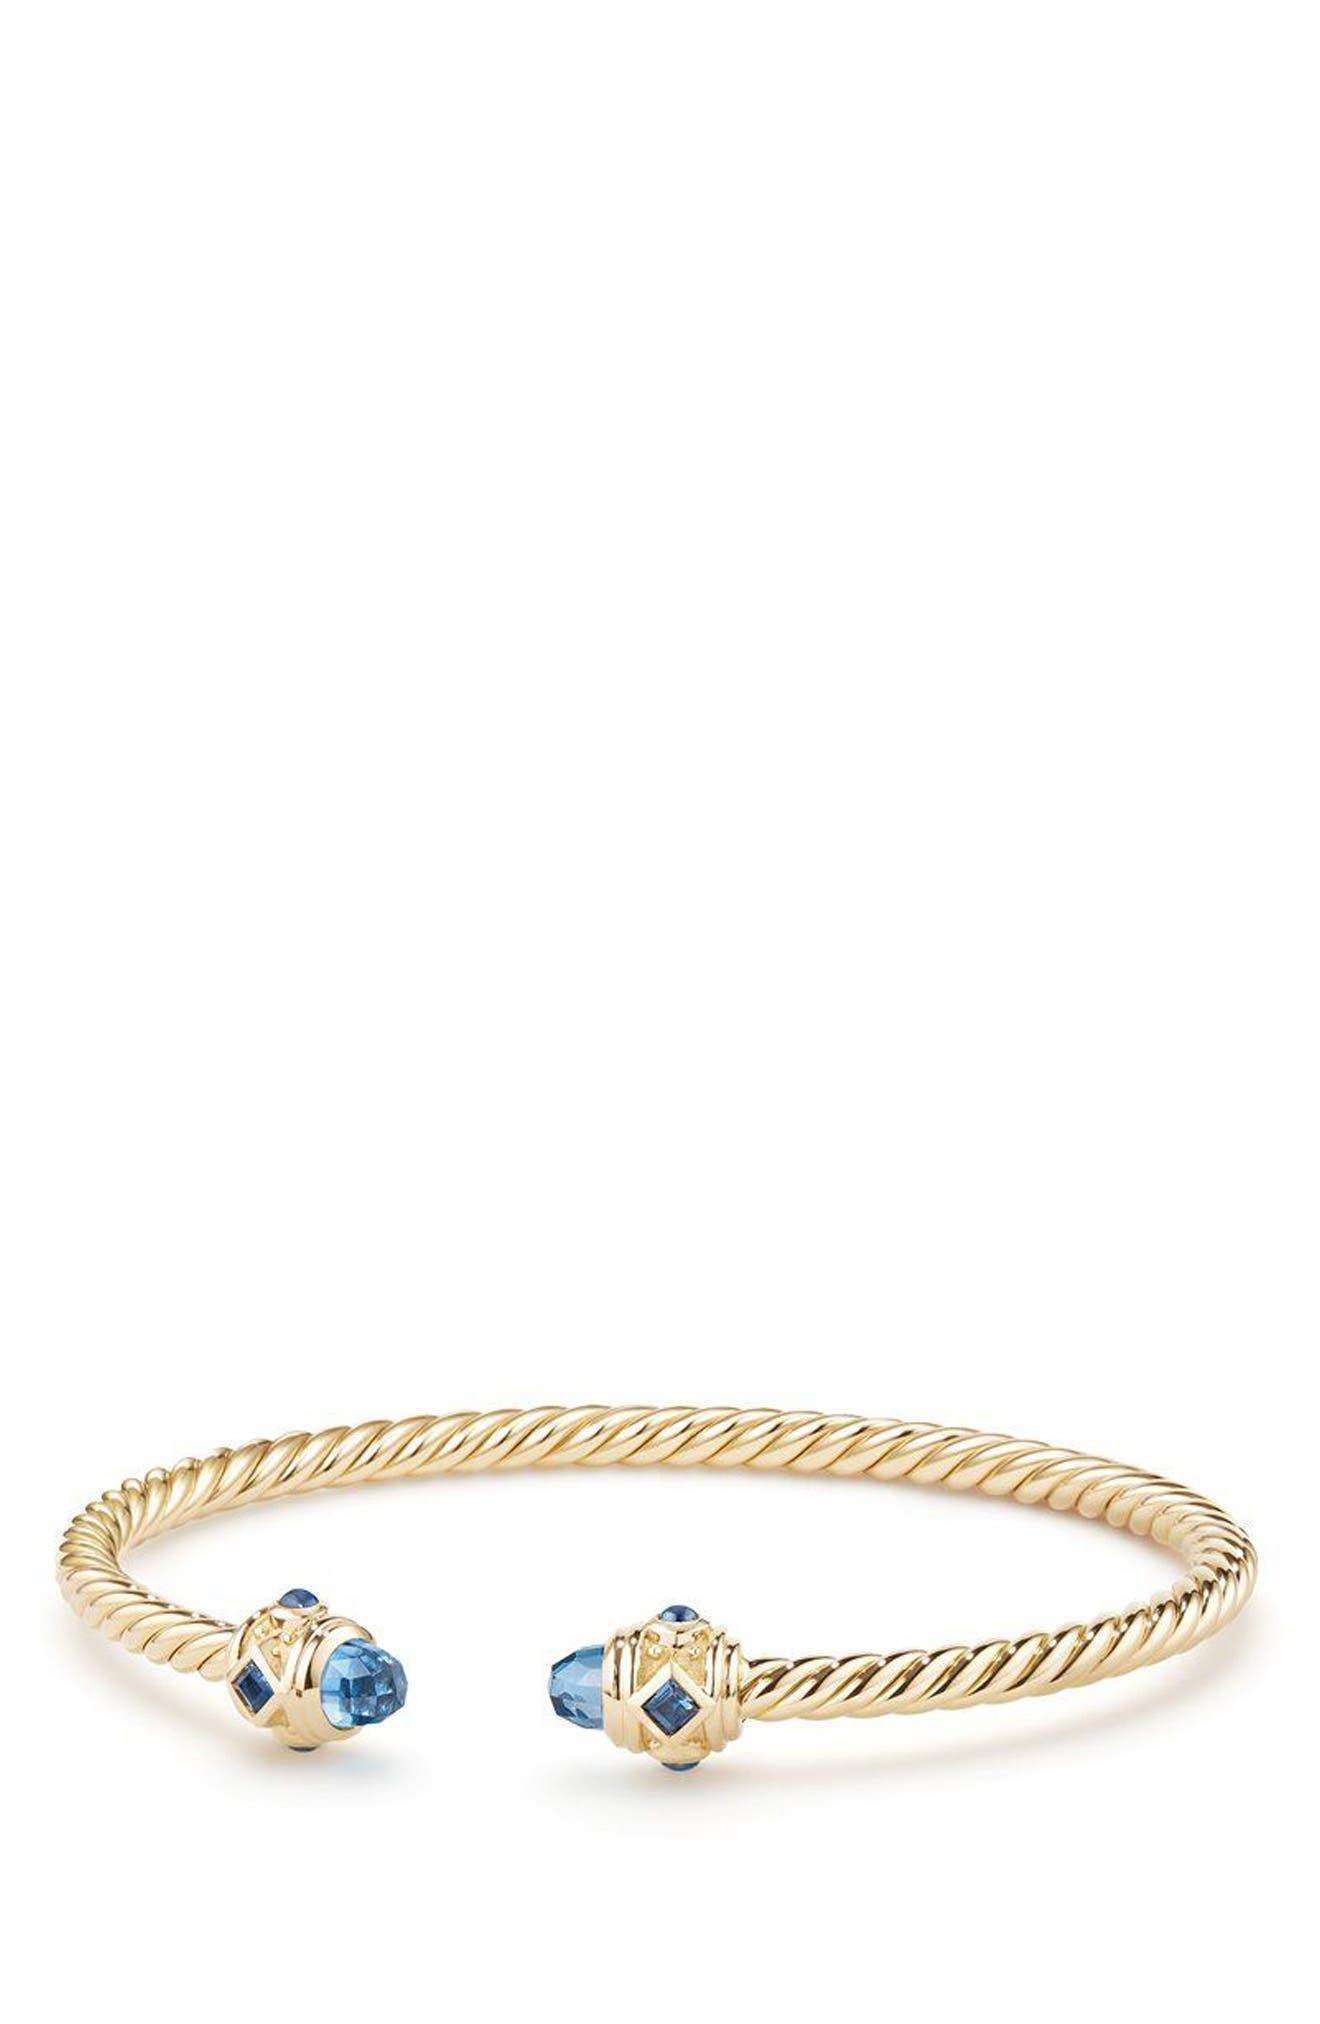 DAVID YURMAN Renaissance Bracelet in 18K Gold, 3.5mm, Main, color, GOLD/ HAMPTON BLUE TOPAZ